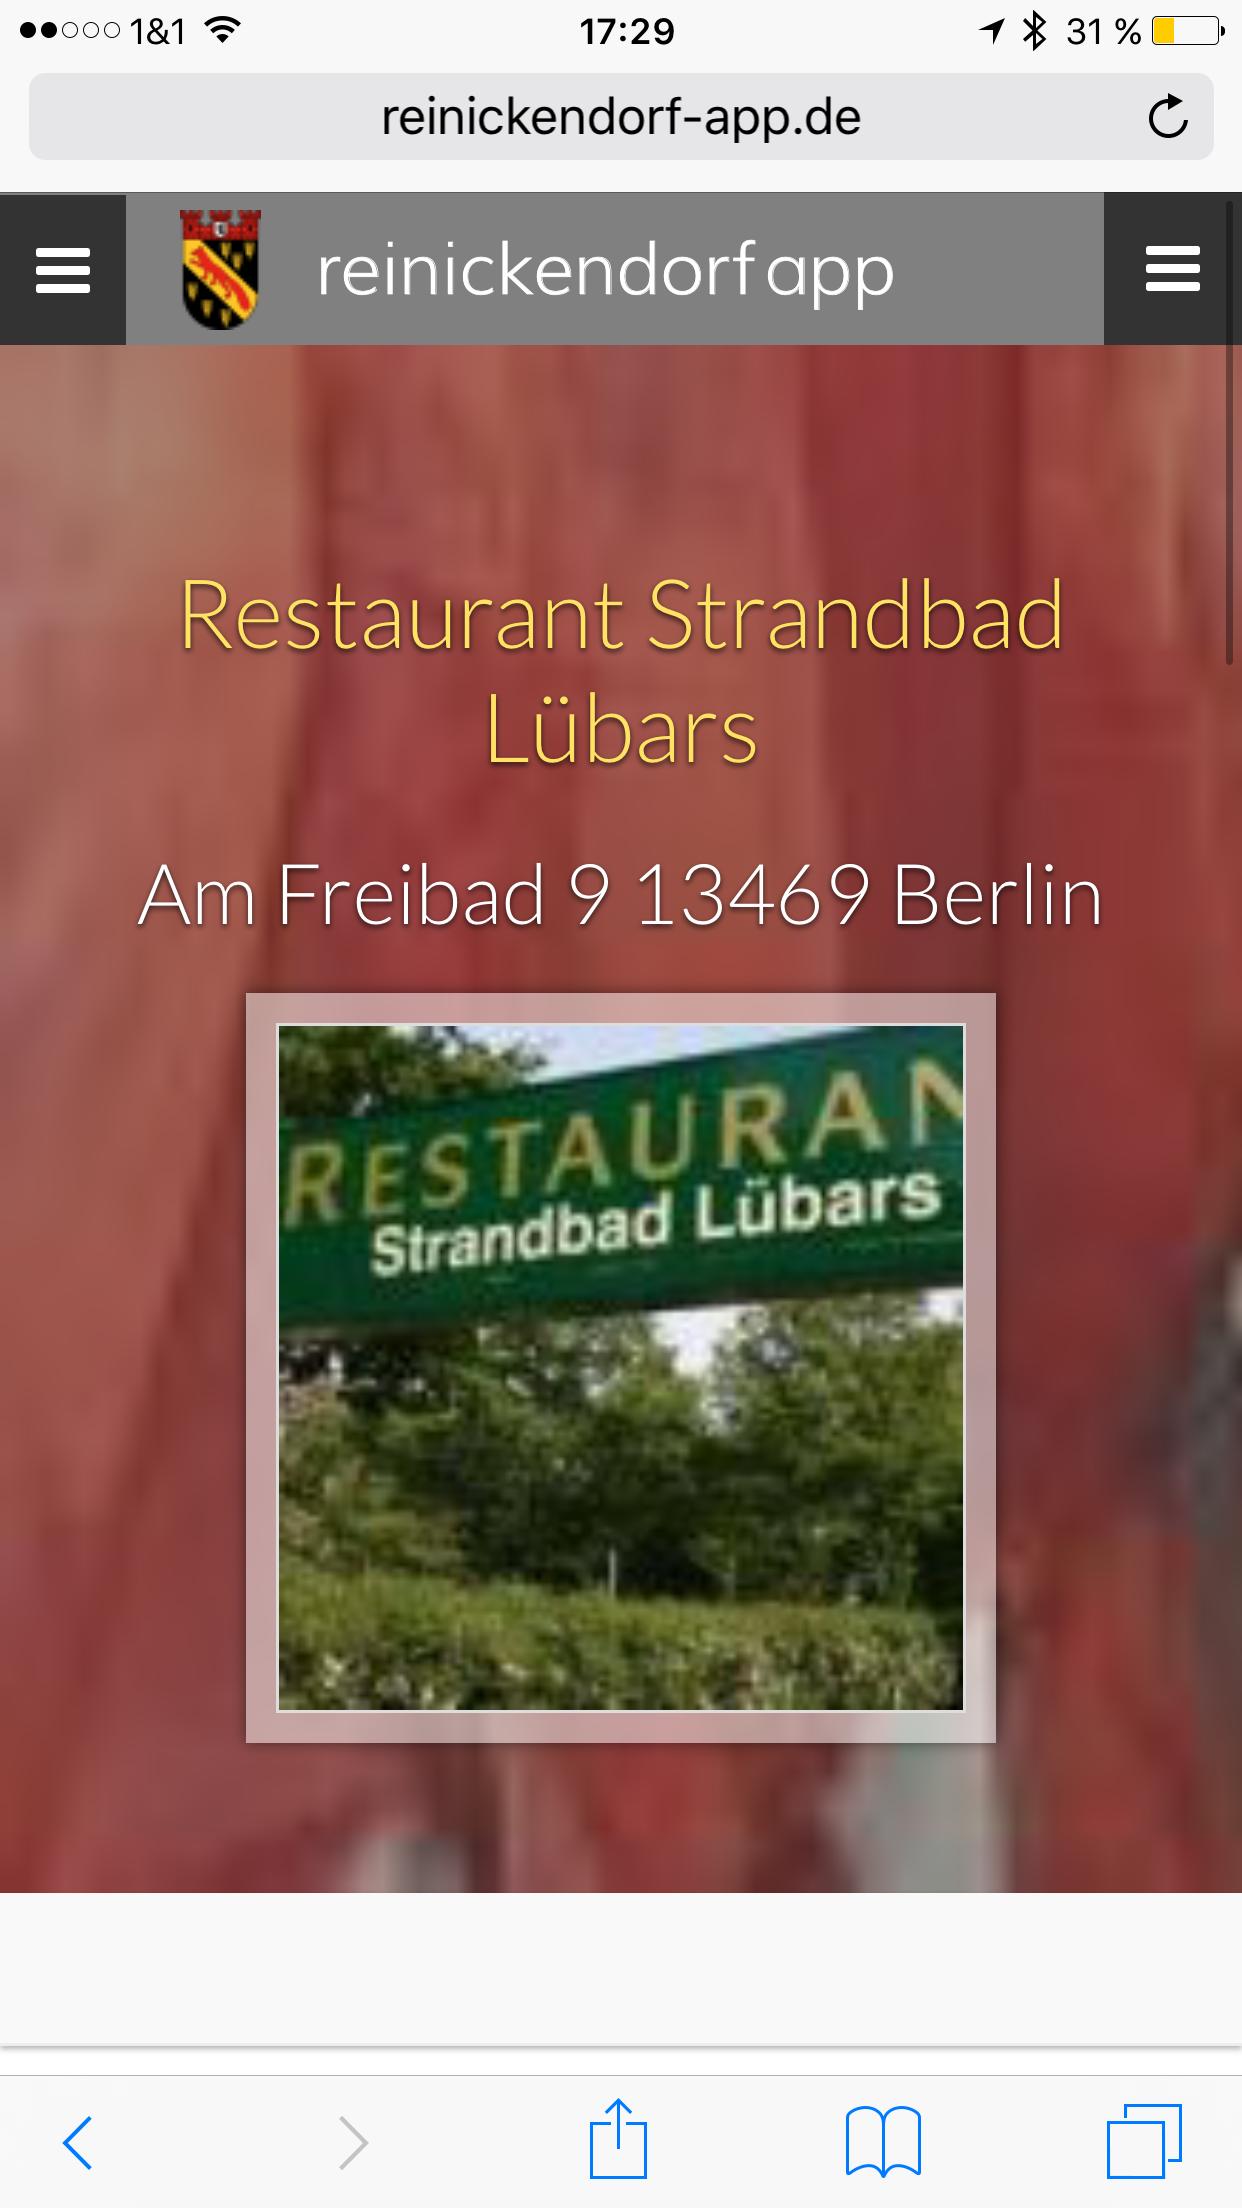 Reinickendorf App - Strandbad Lübars